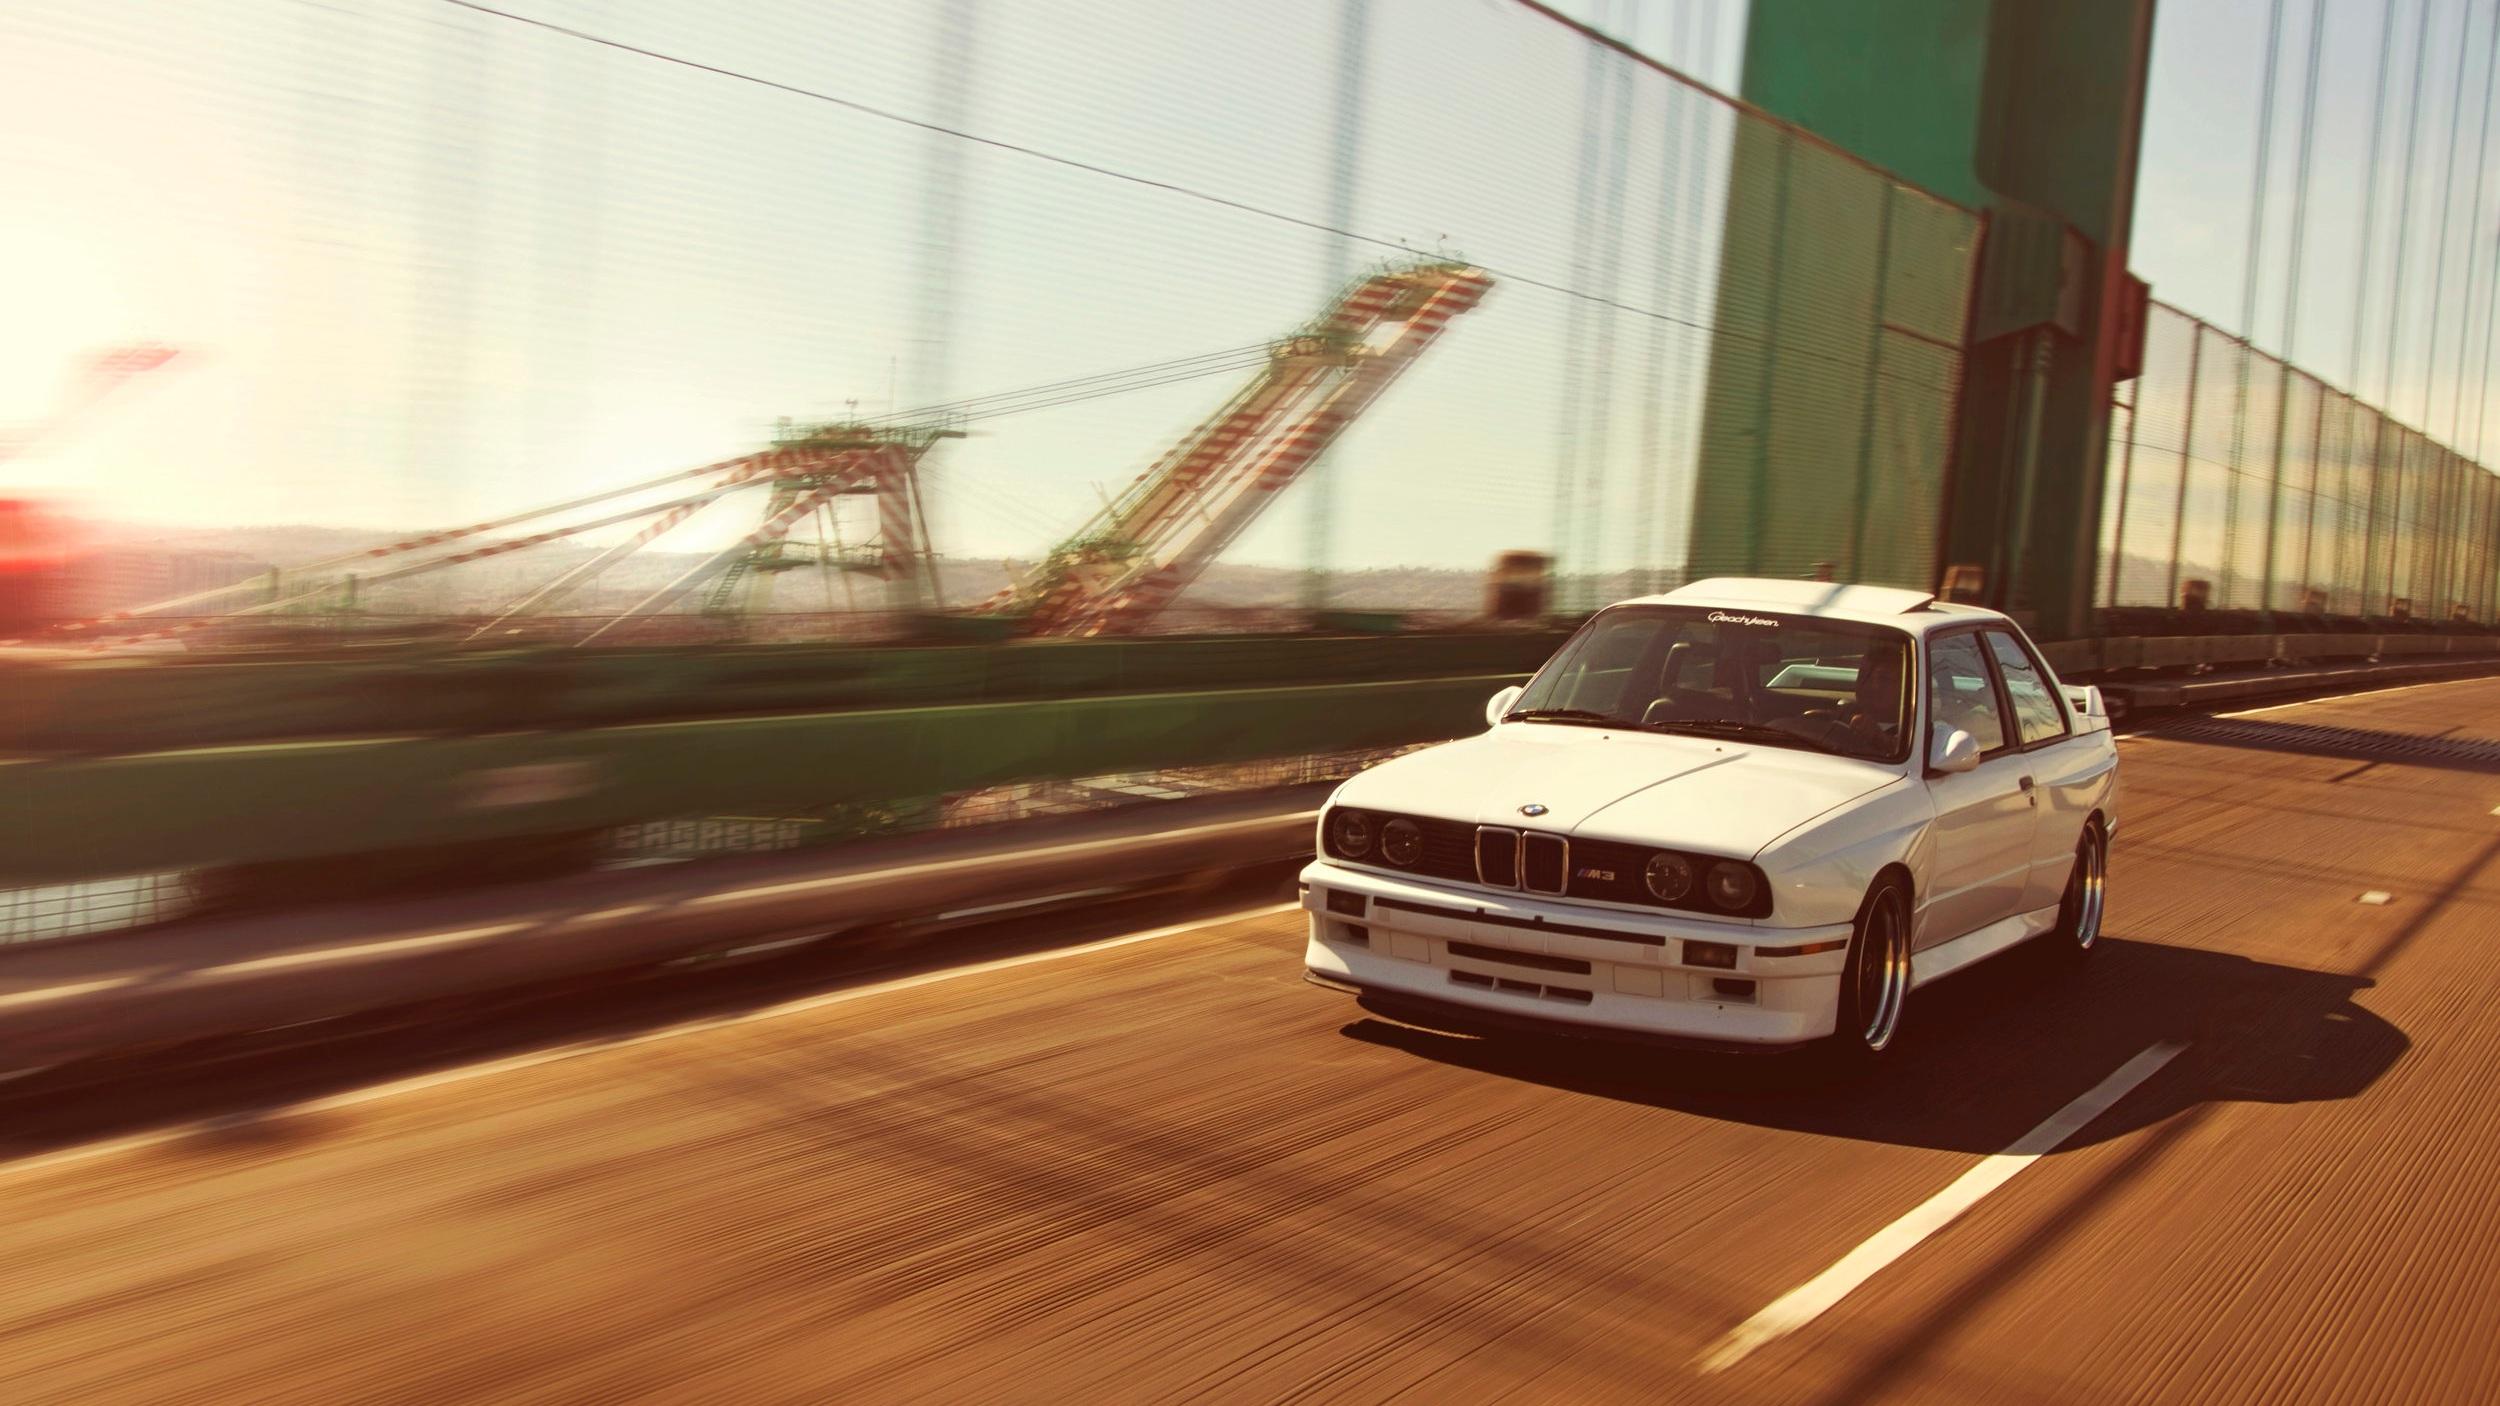 LA_M3_brdge_roller.jpg